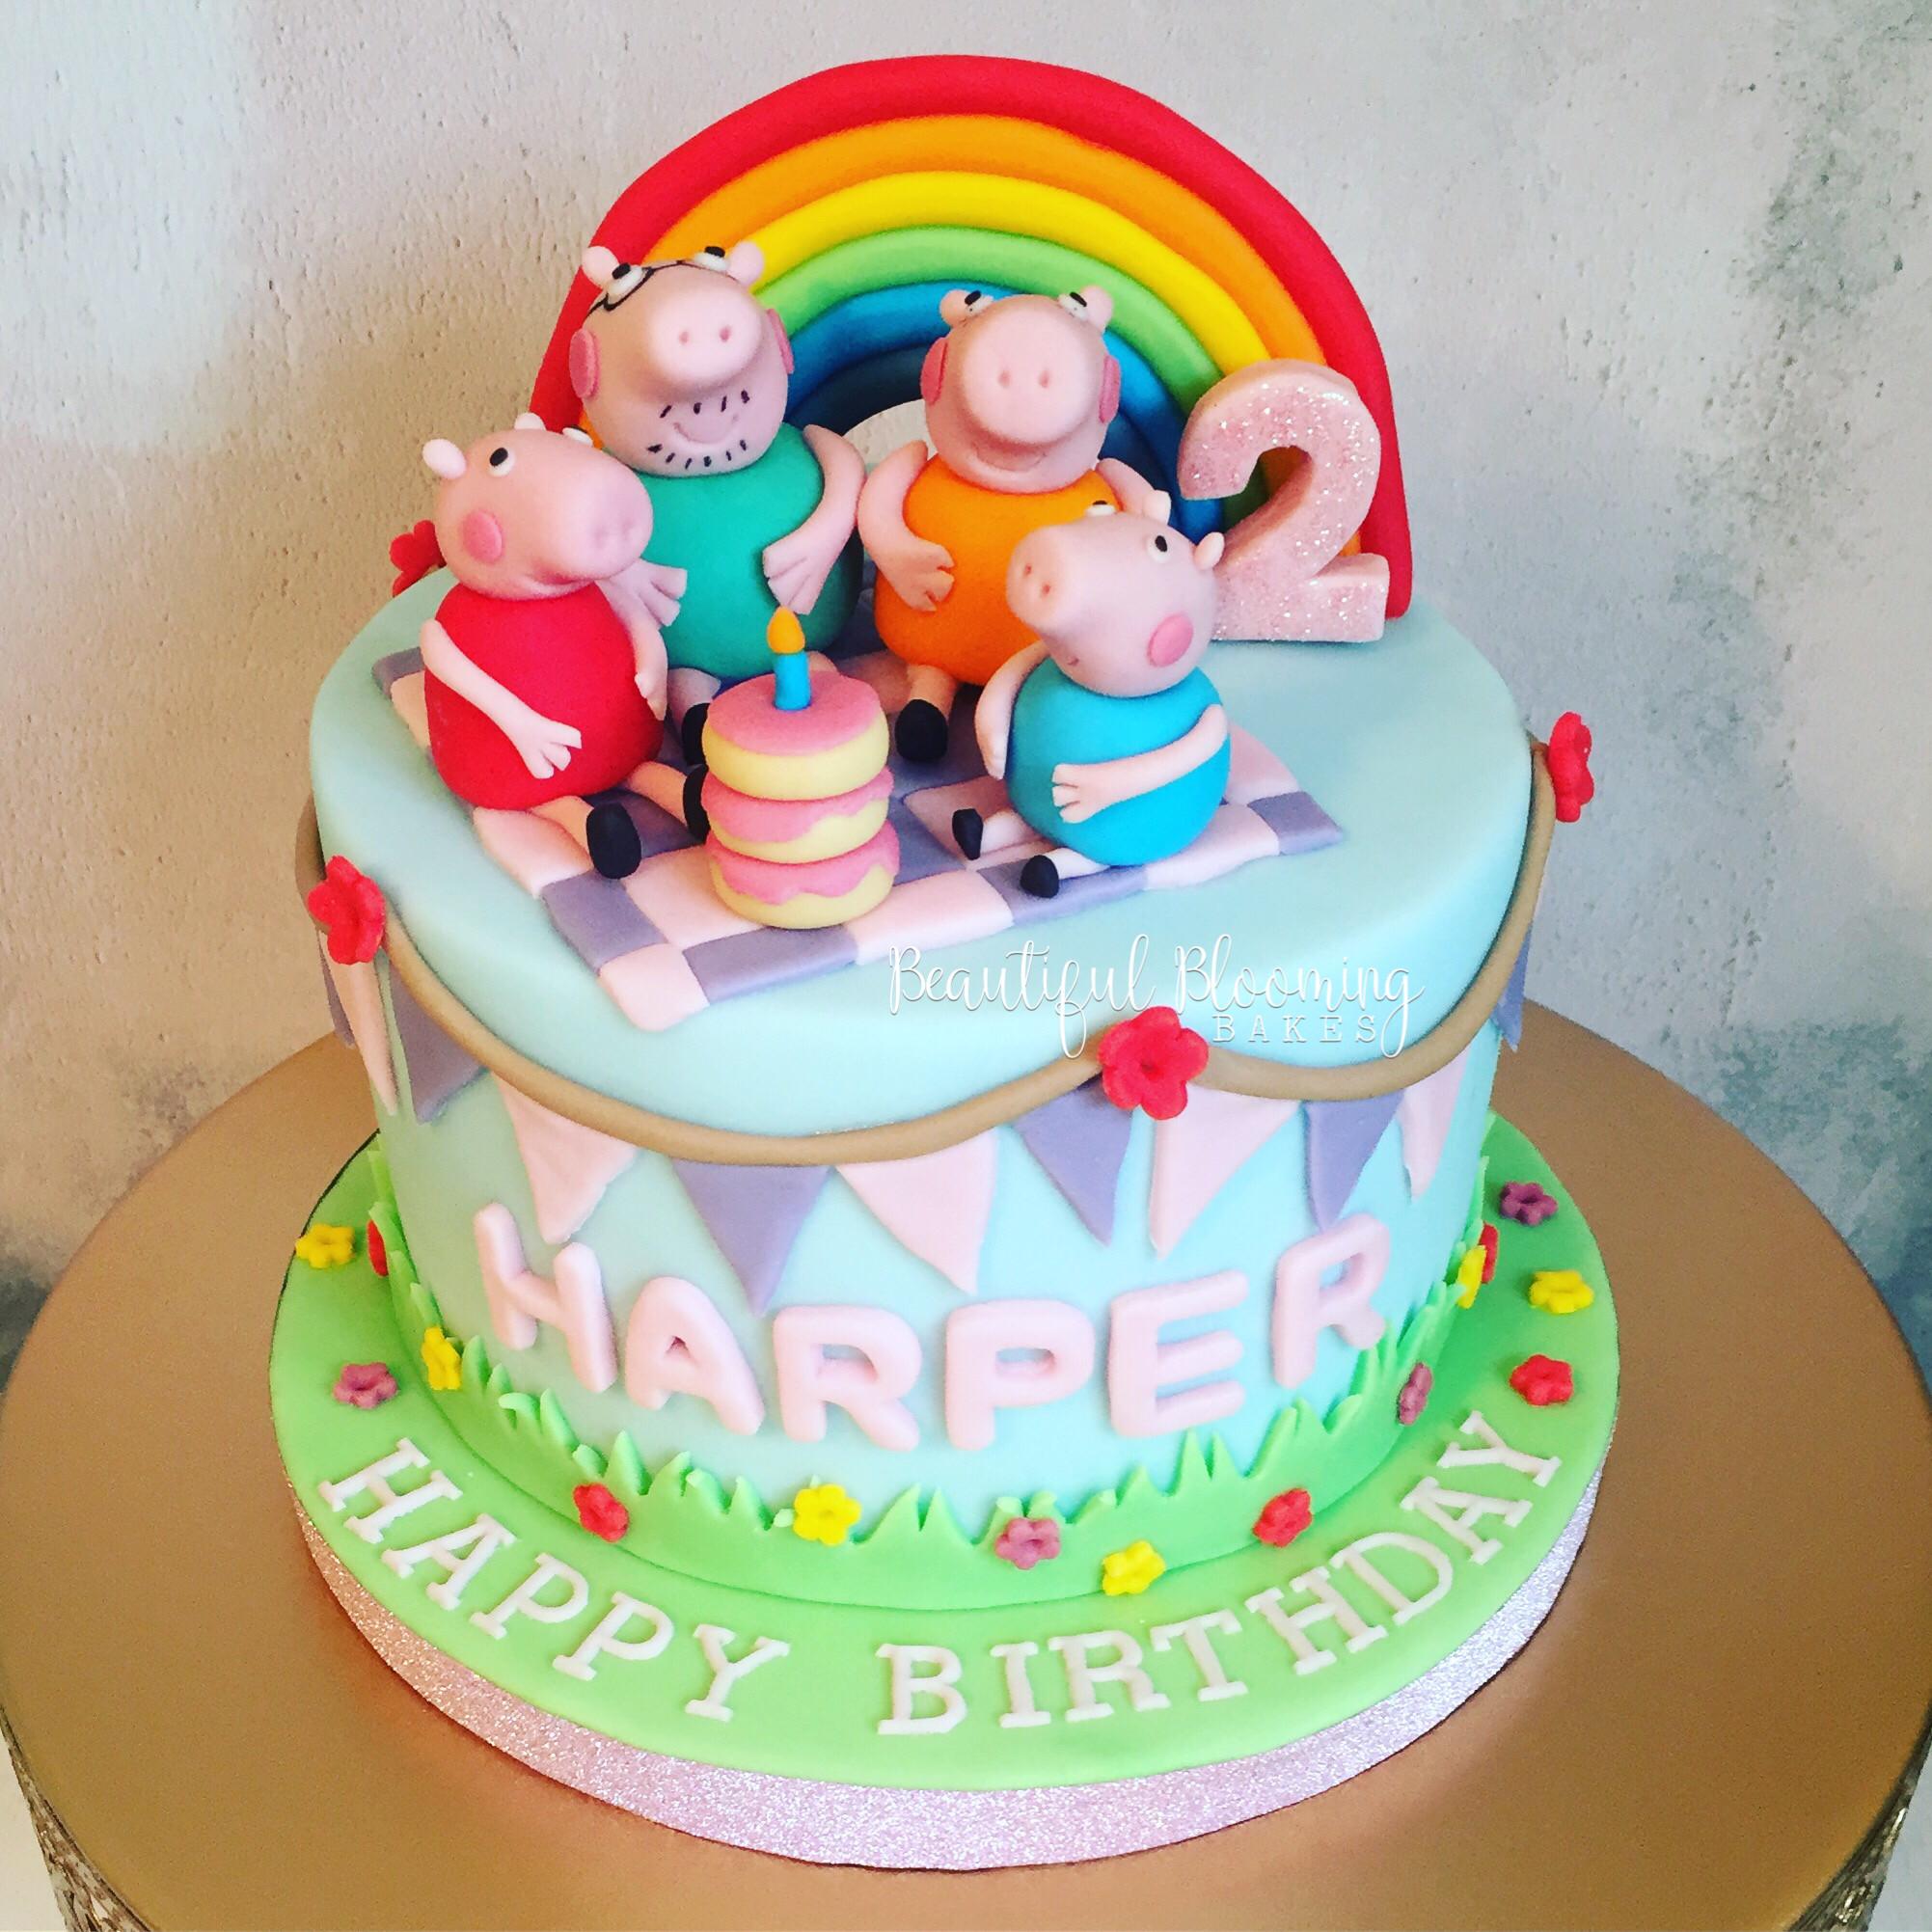 Peppa Pig Birthday Cake.6 Inch Peppa Pig Birthday Cake